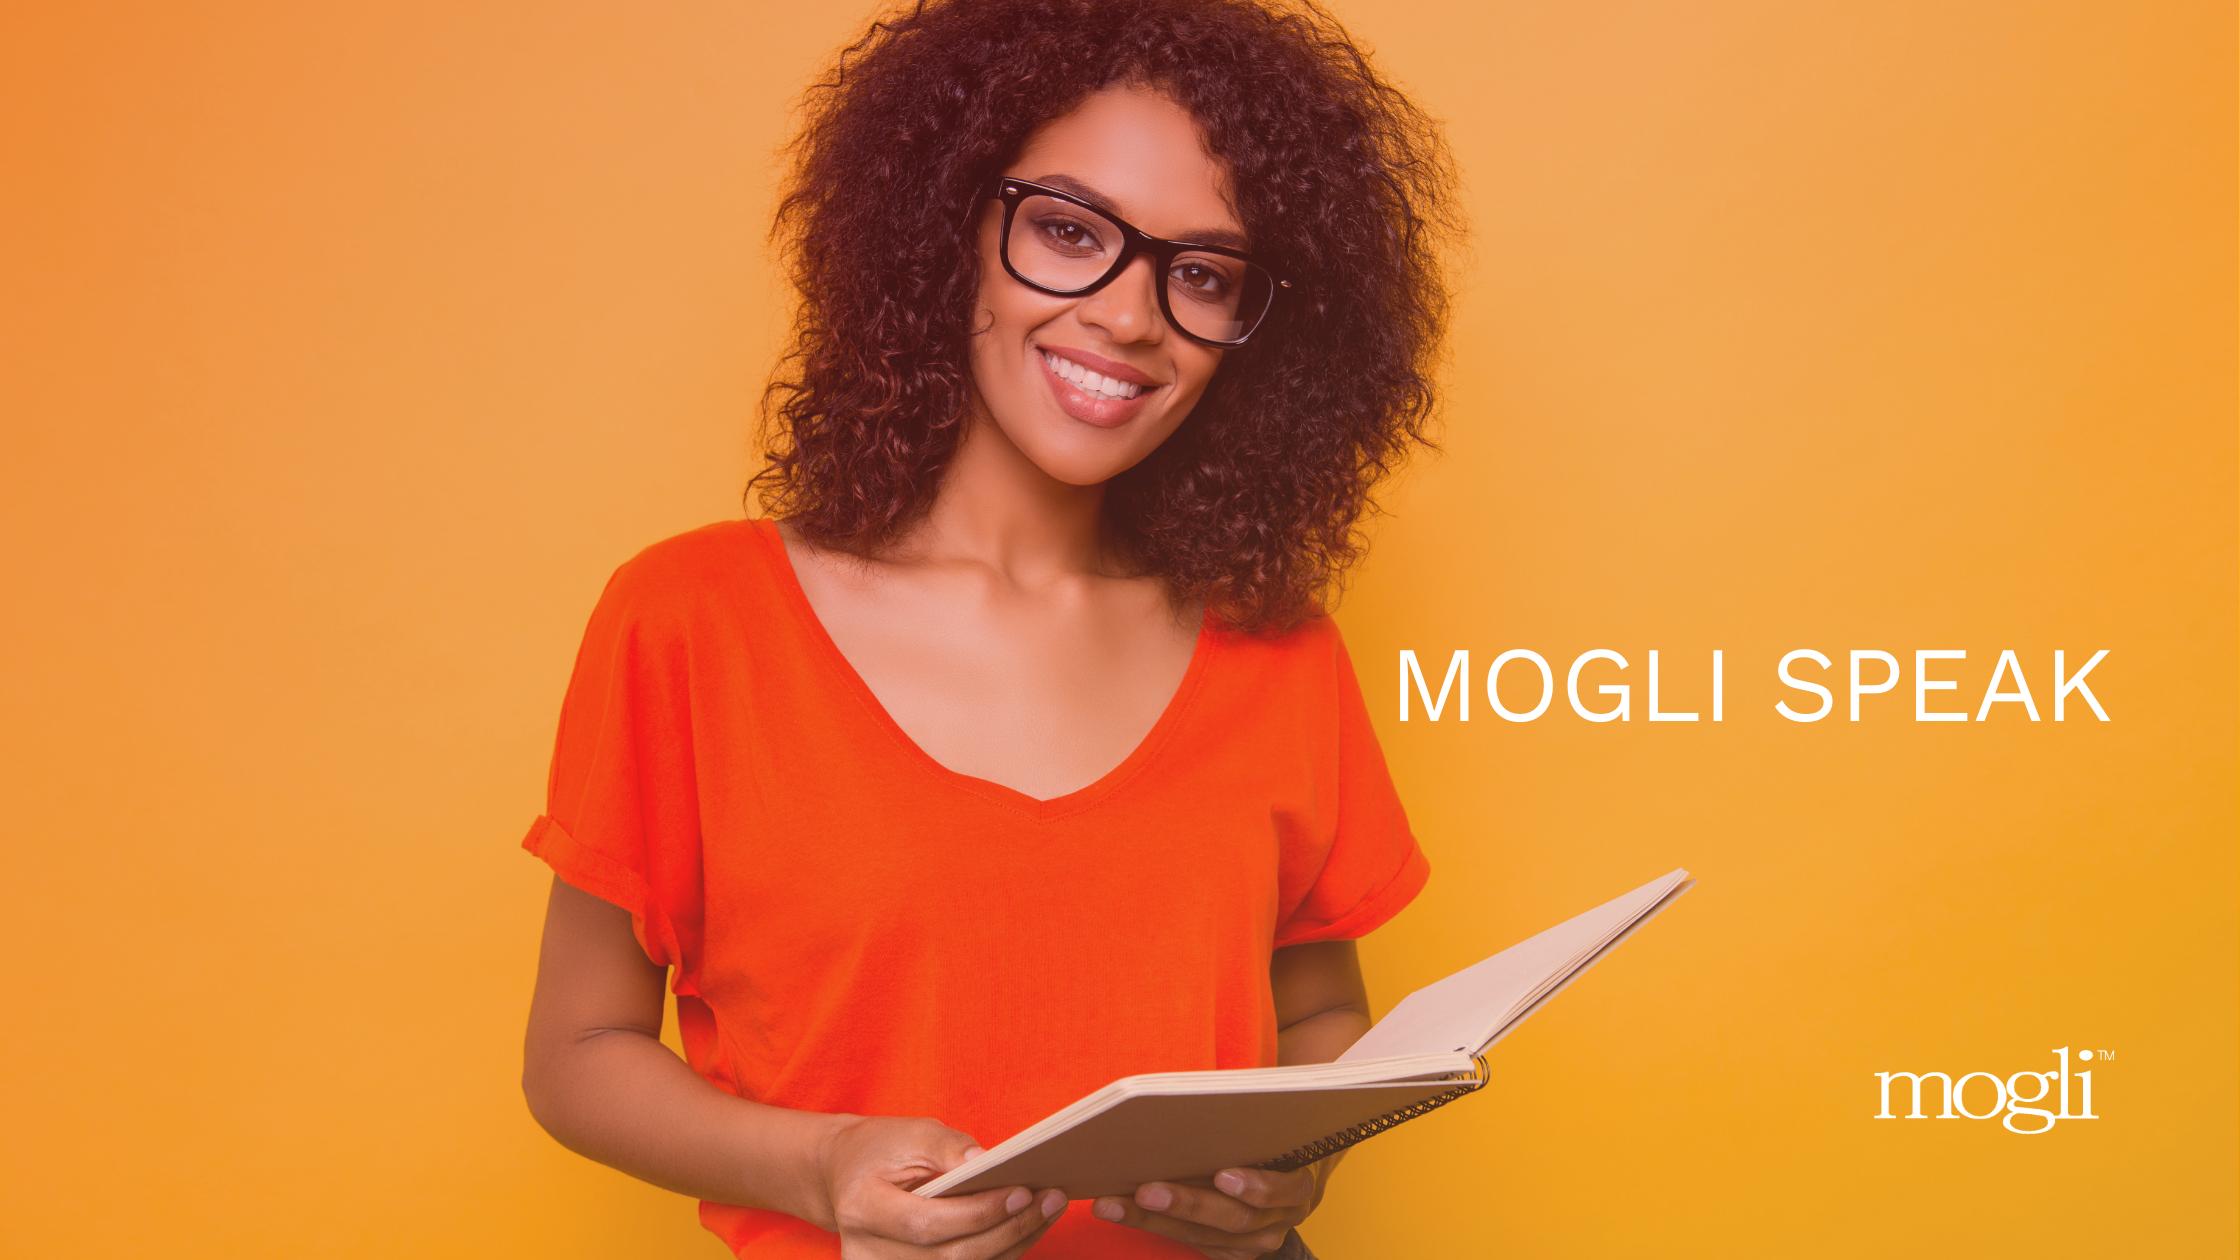 mogli speak for salesforce knowledge base article